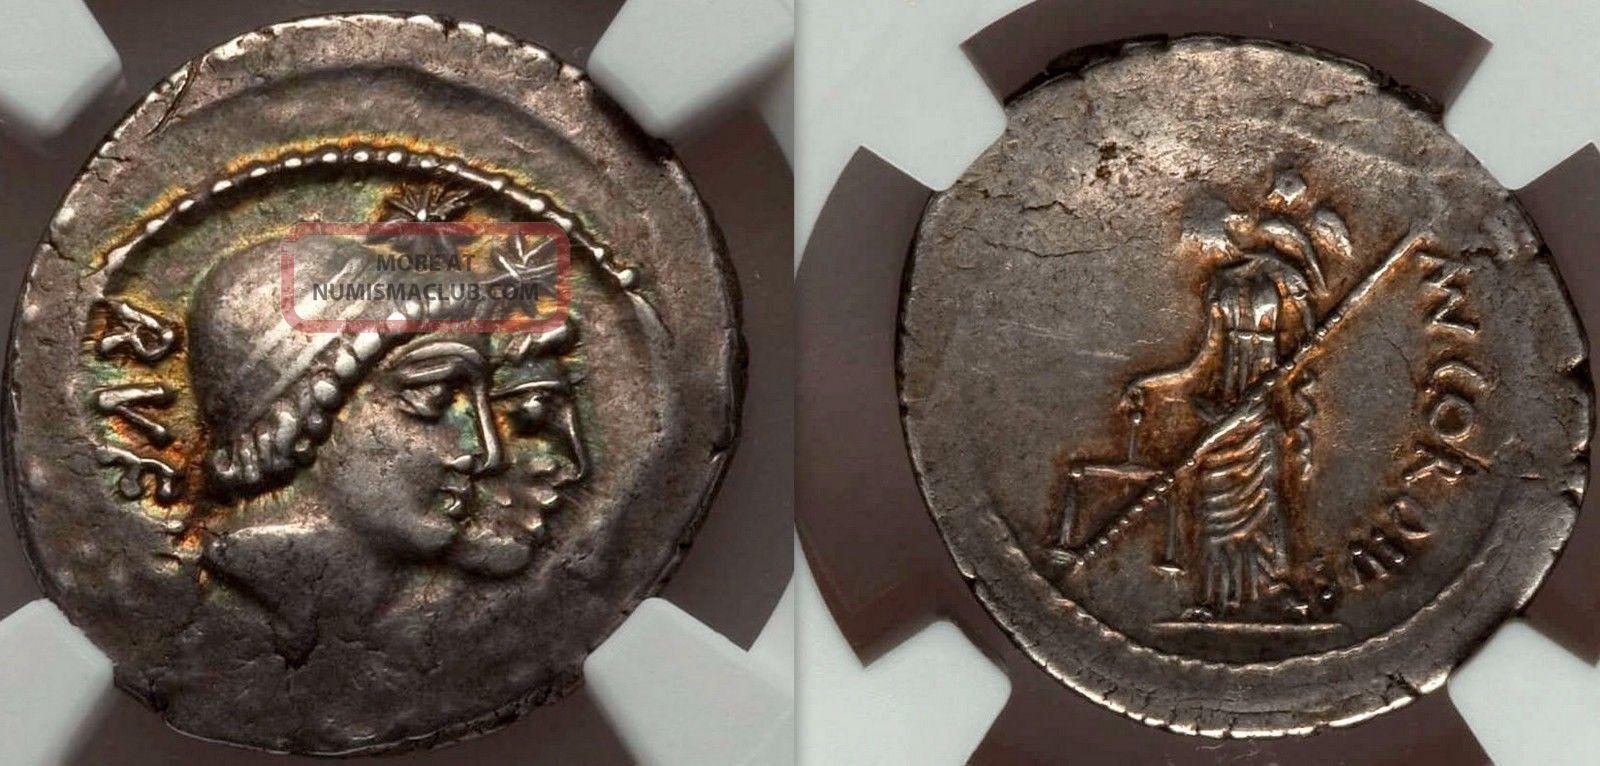 Ngc Xf.  Gold Iridescent Patina.  Discuri And Venus Very Rare Roman Coin. Coins: Ancient photo